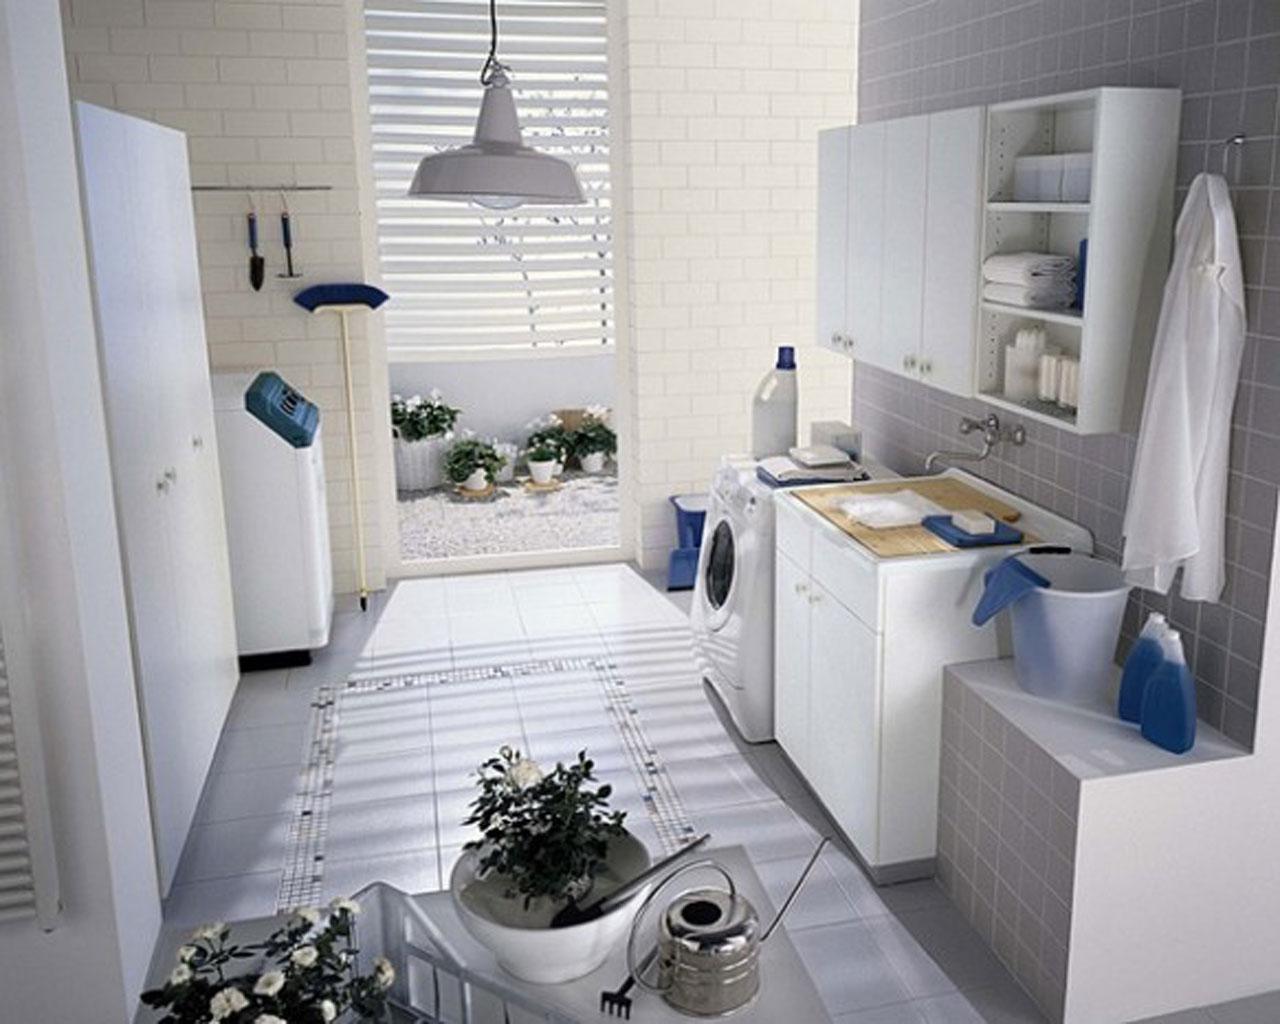 Laundry Room Design Idea